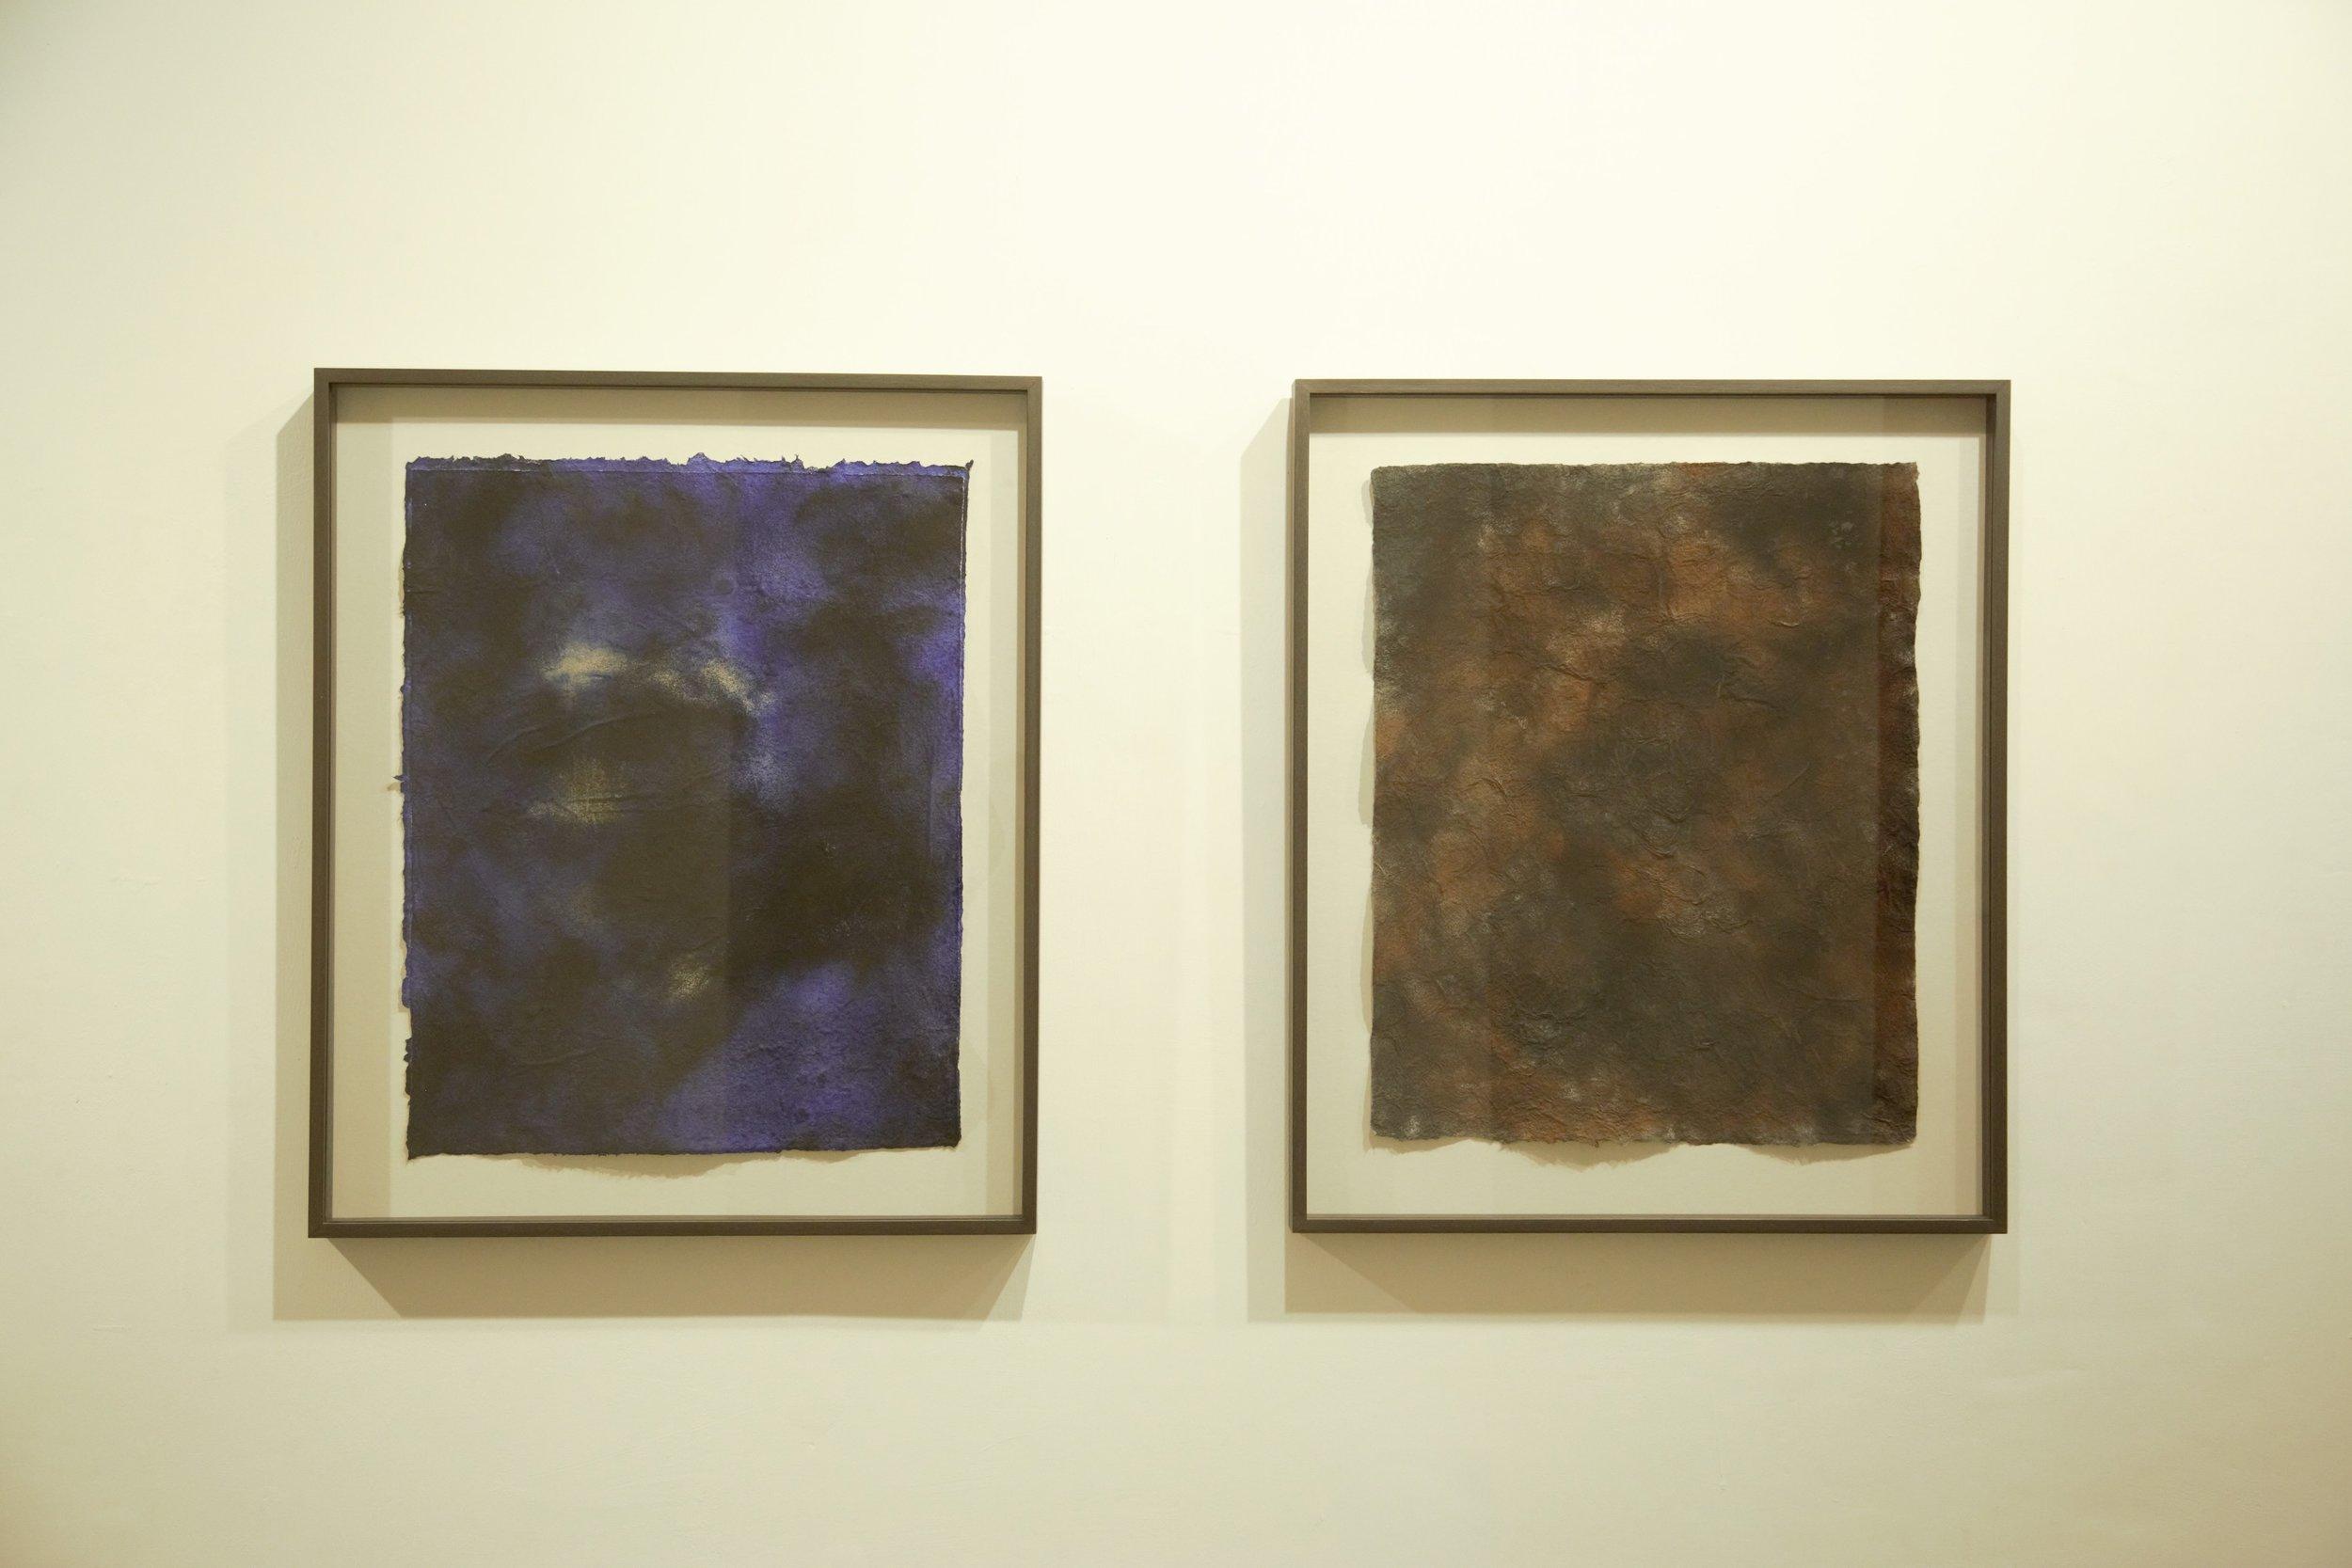 Manisha Parekh, Earth Series, 2016